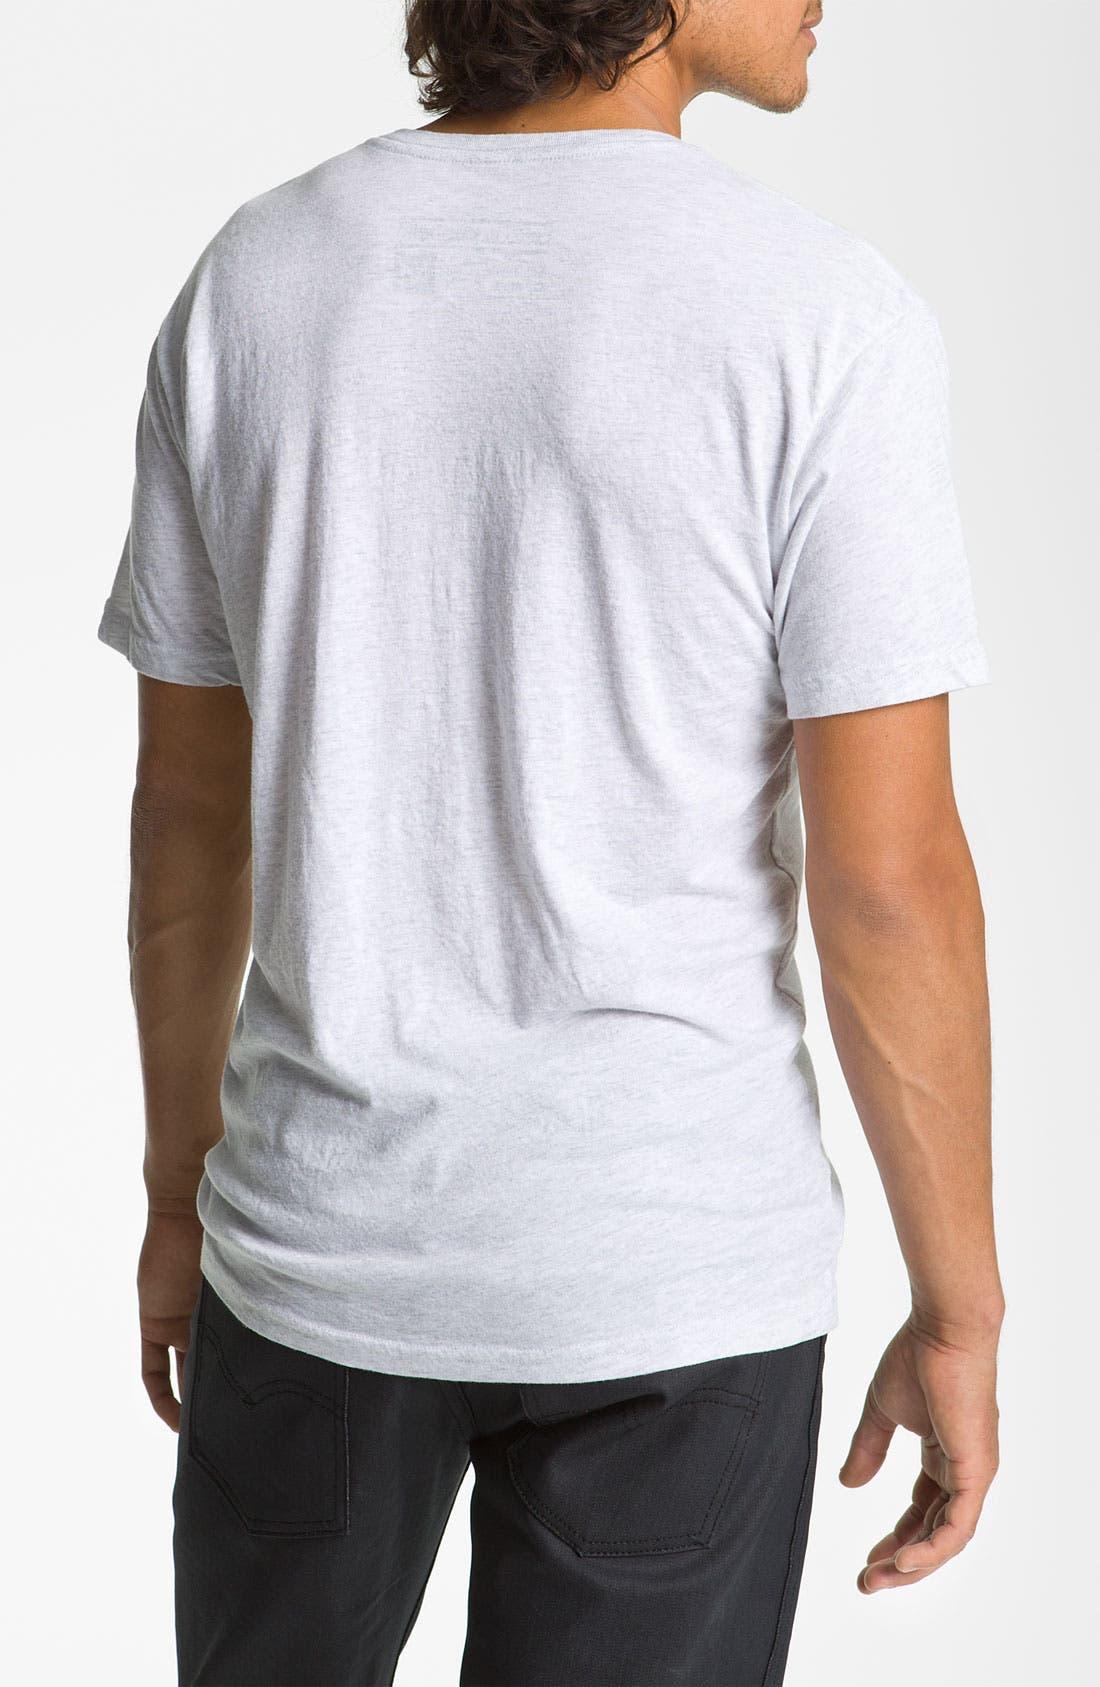 Alternate Image 2  - Profound Aesthetic 'No. 2 Pencil' Graphic T-Shirt